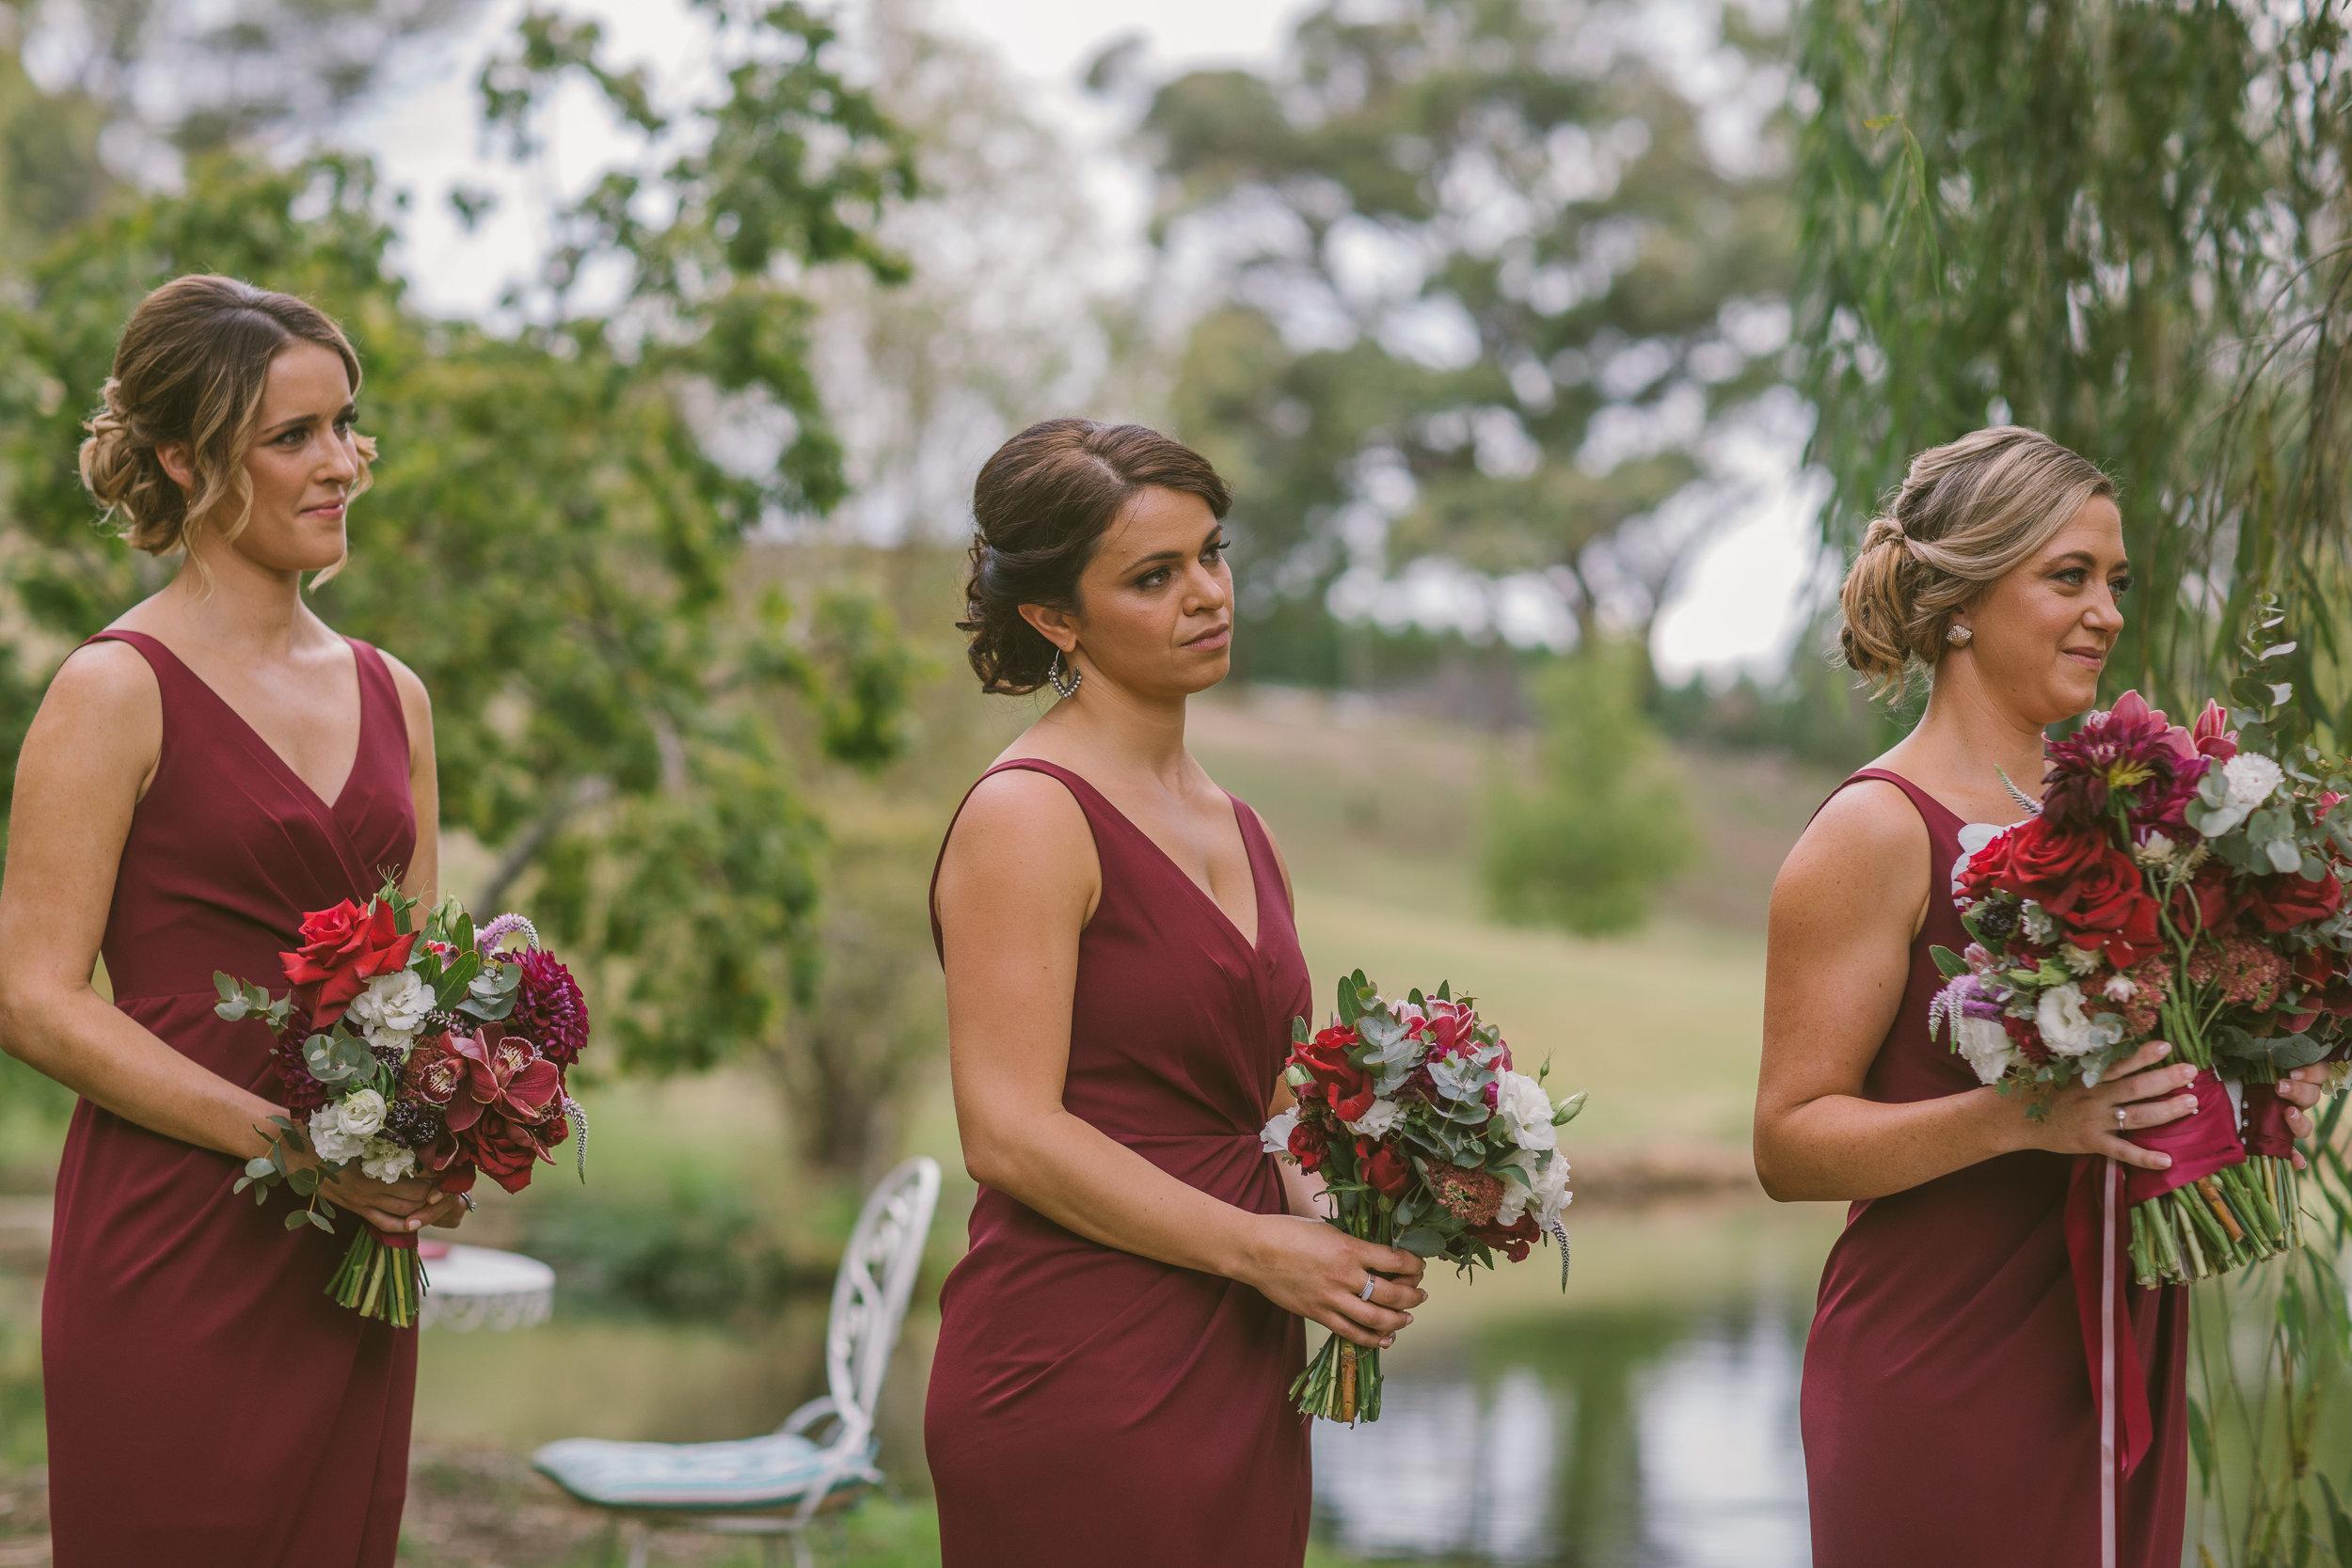 Sarah + Jason - Mali Brae Farm Wedding Photographer - Magnus Agren Photography-0307.jpg